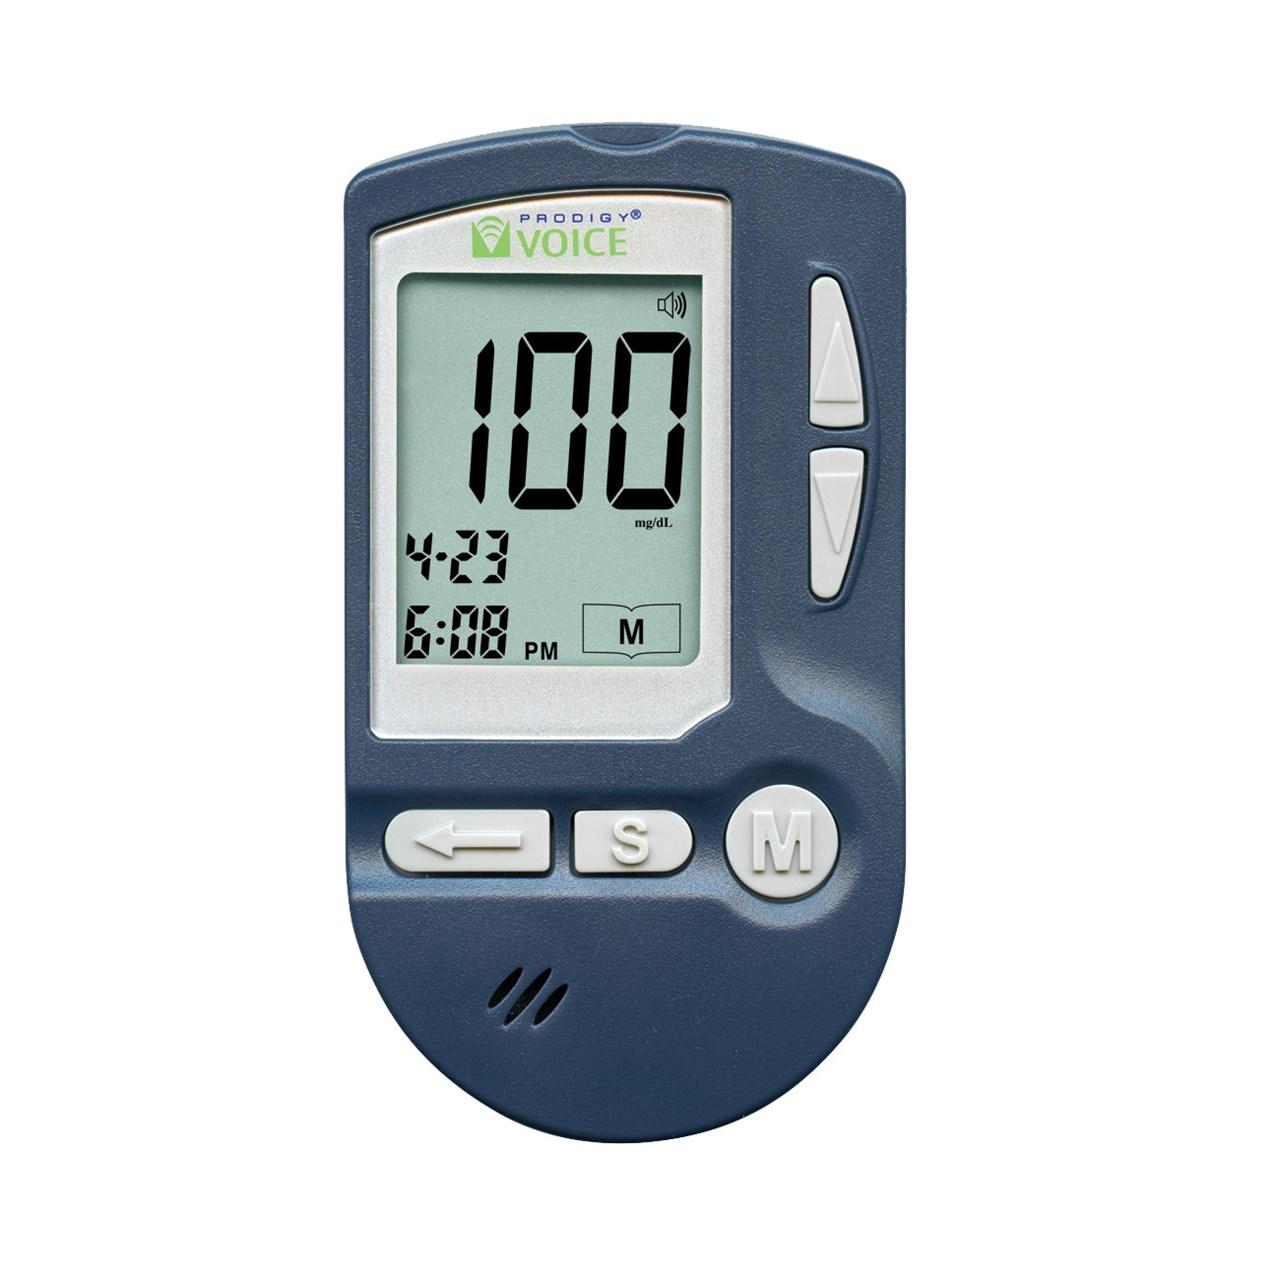 MaxiAids   PRODIGY VOICE Talking Blood Glucose Monitor Kit